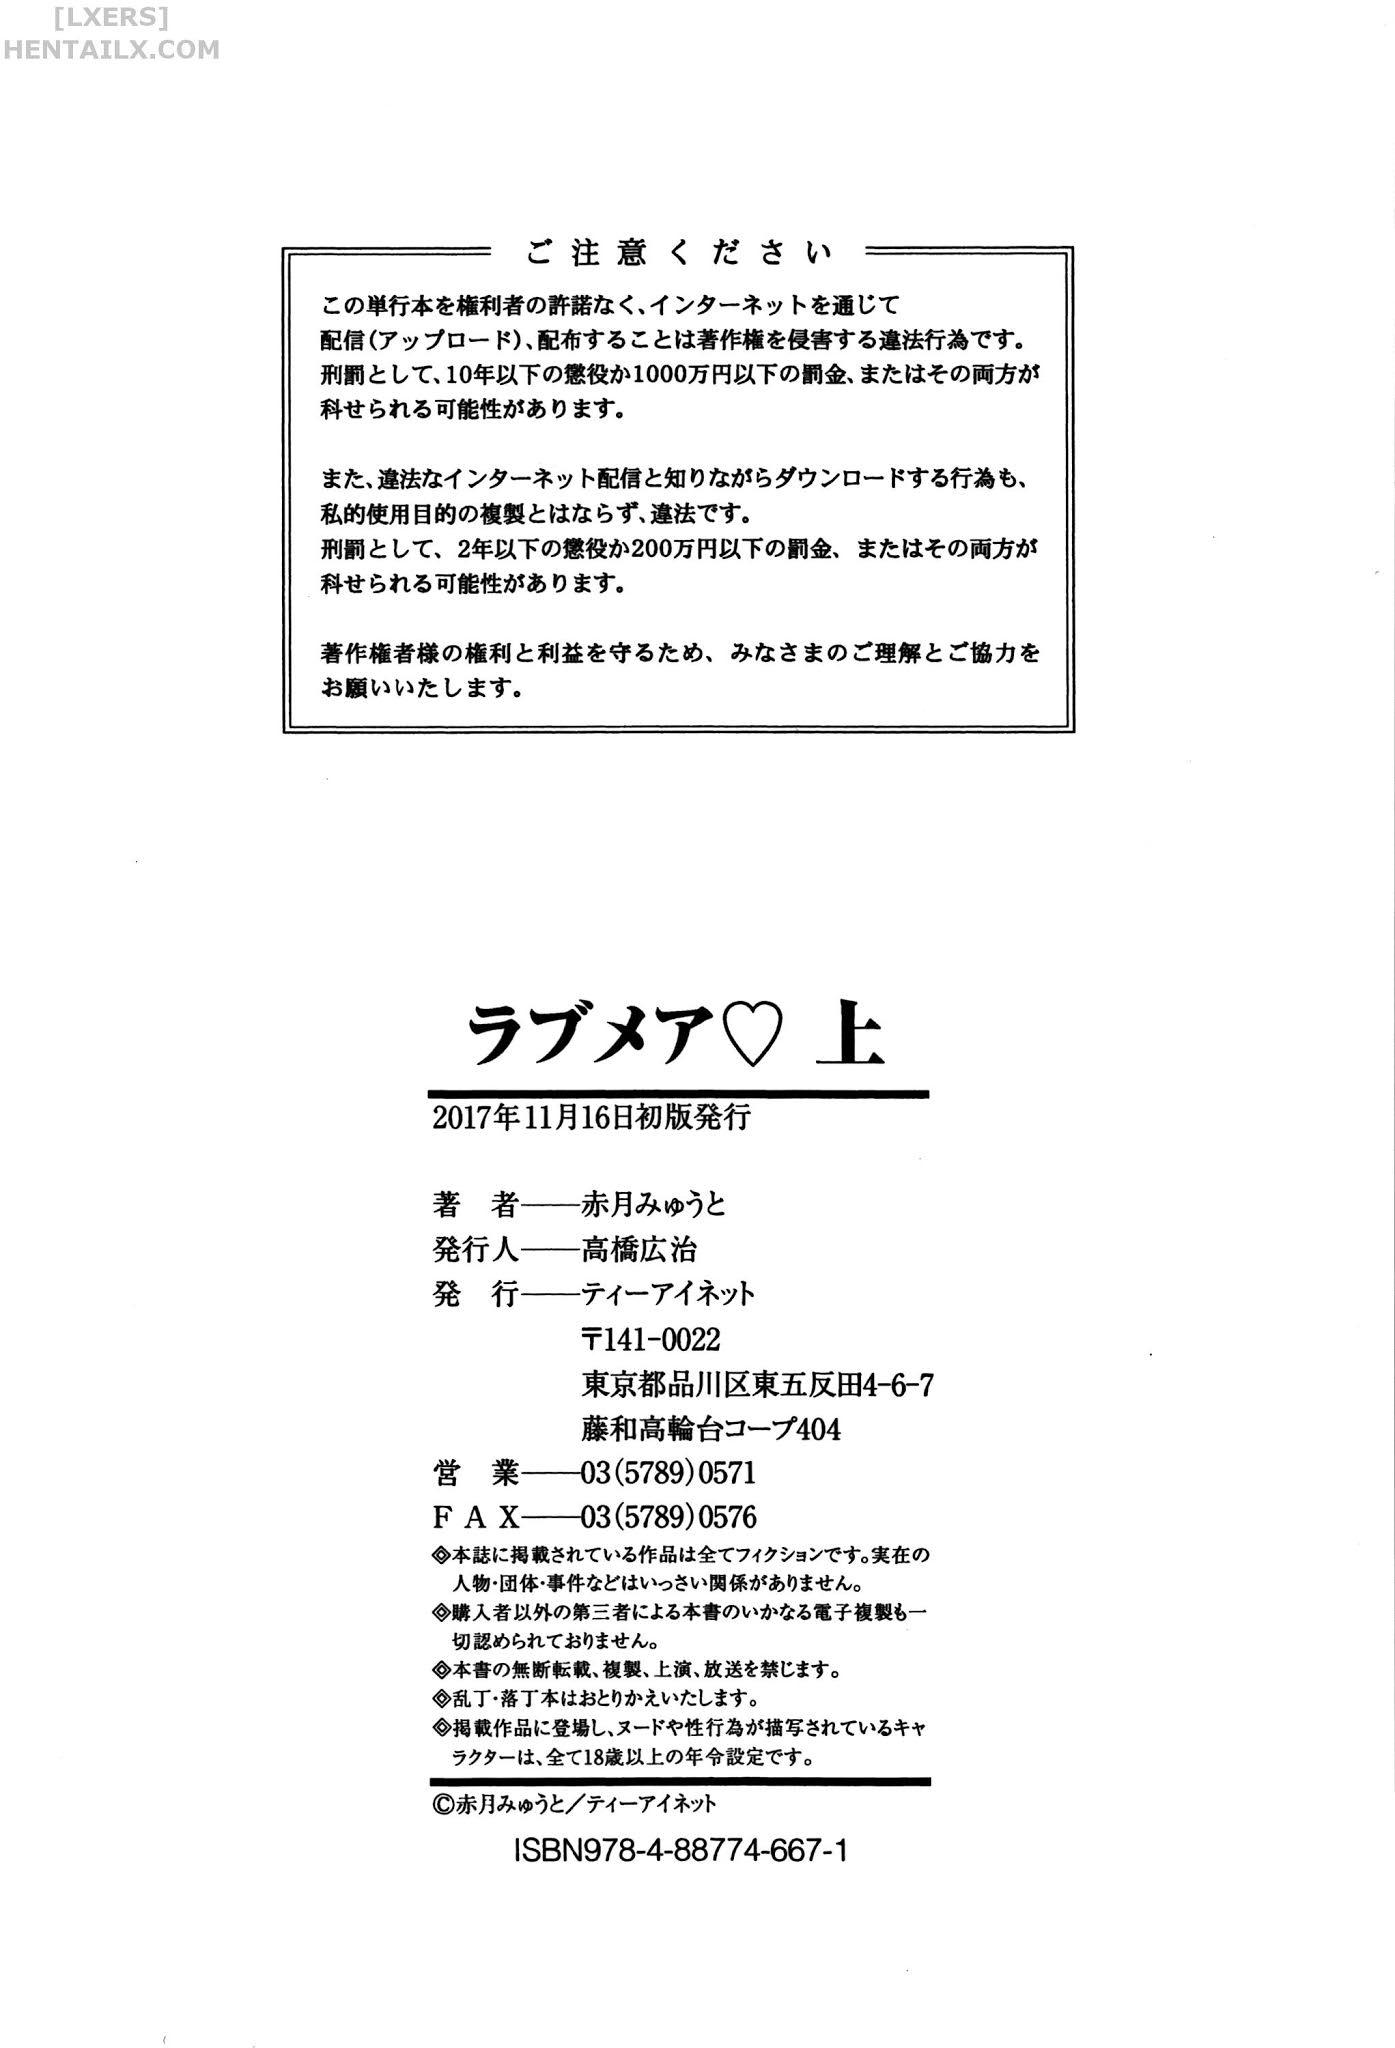 biribiri_Lovemare_222%2Bcopy Lovemare Jou  - hentaicube.net - Truyện tranh hentai online